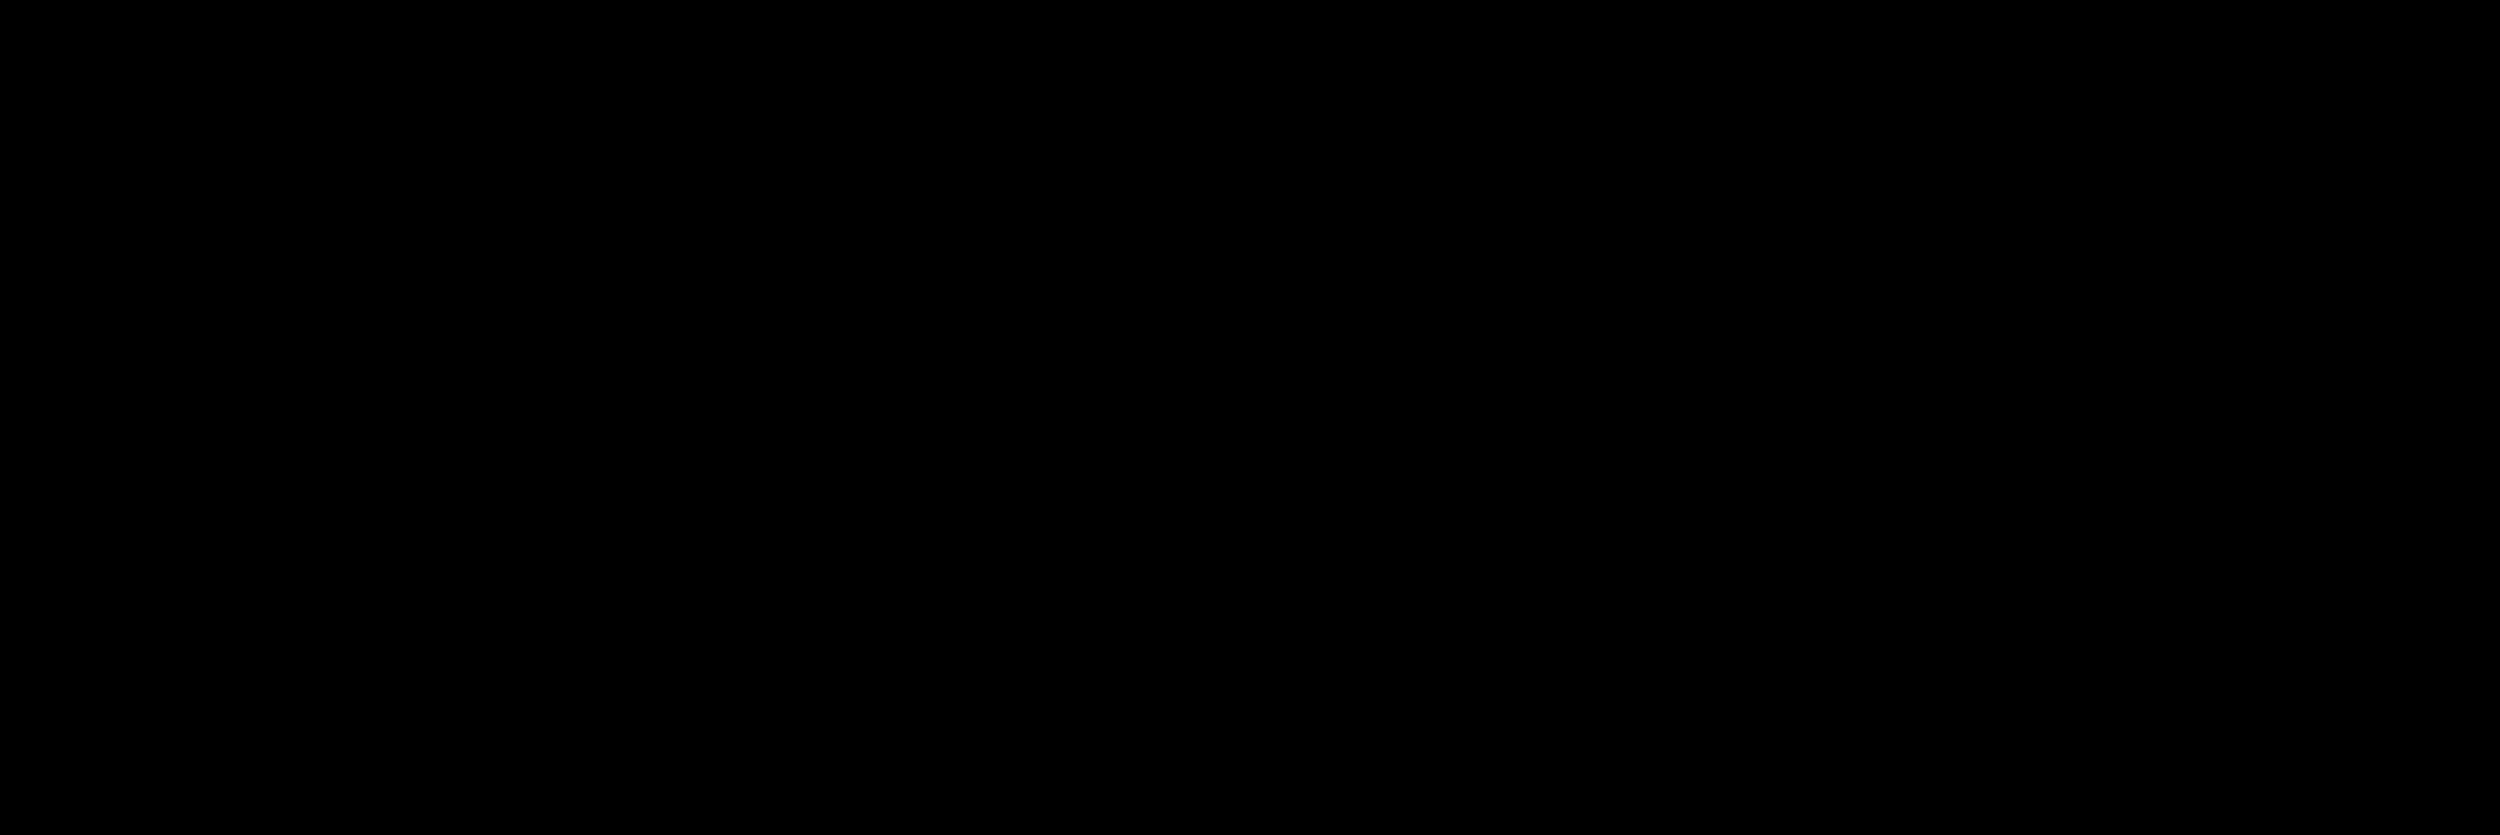 Shifting Spaces Logo - Pos.png